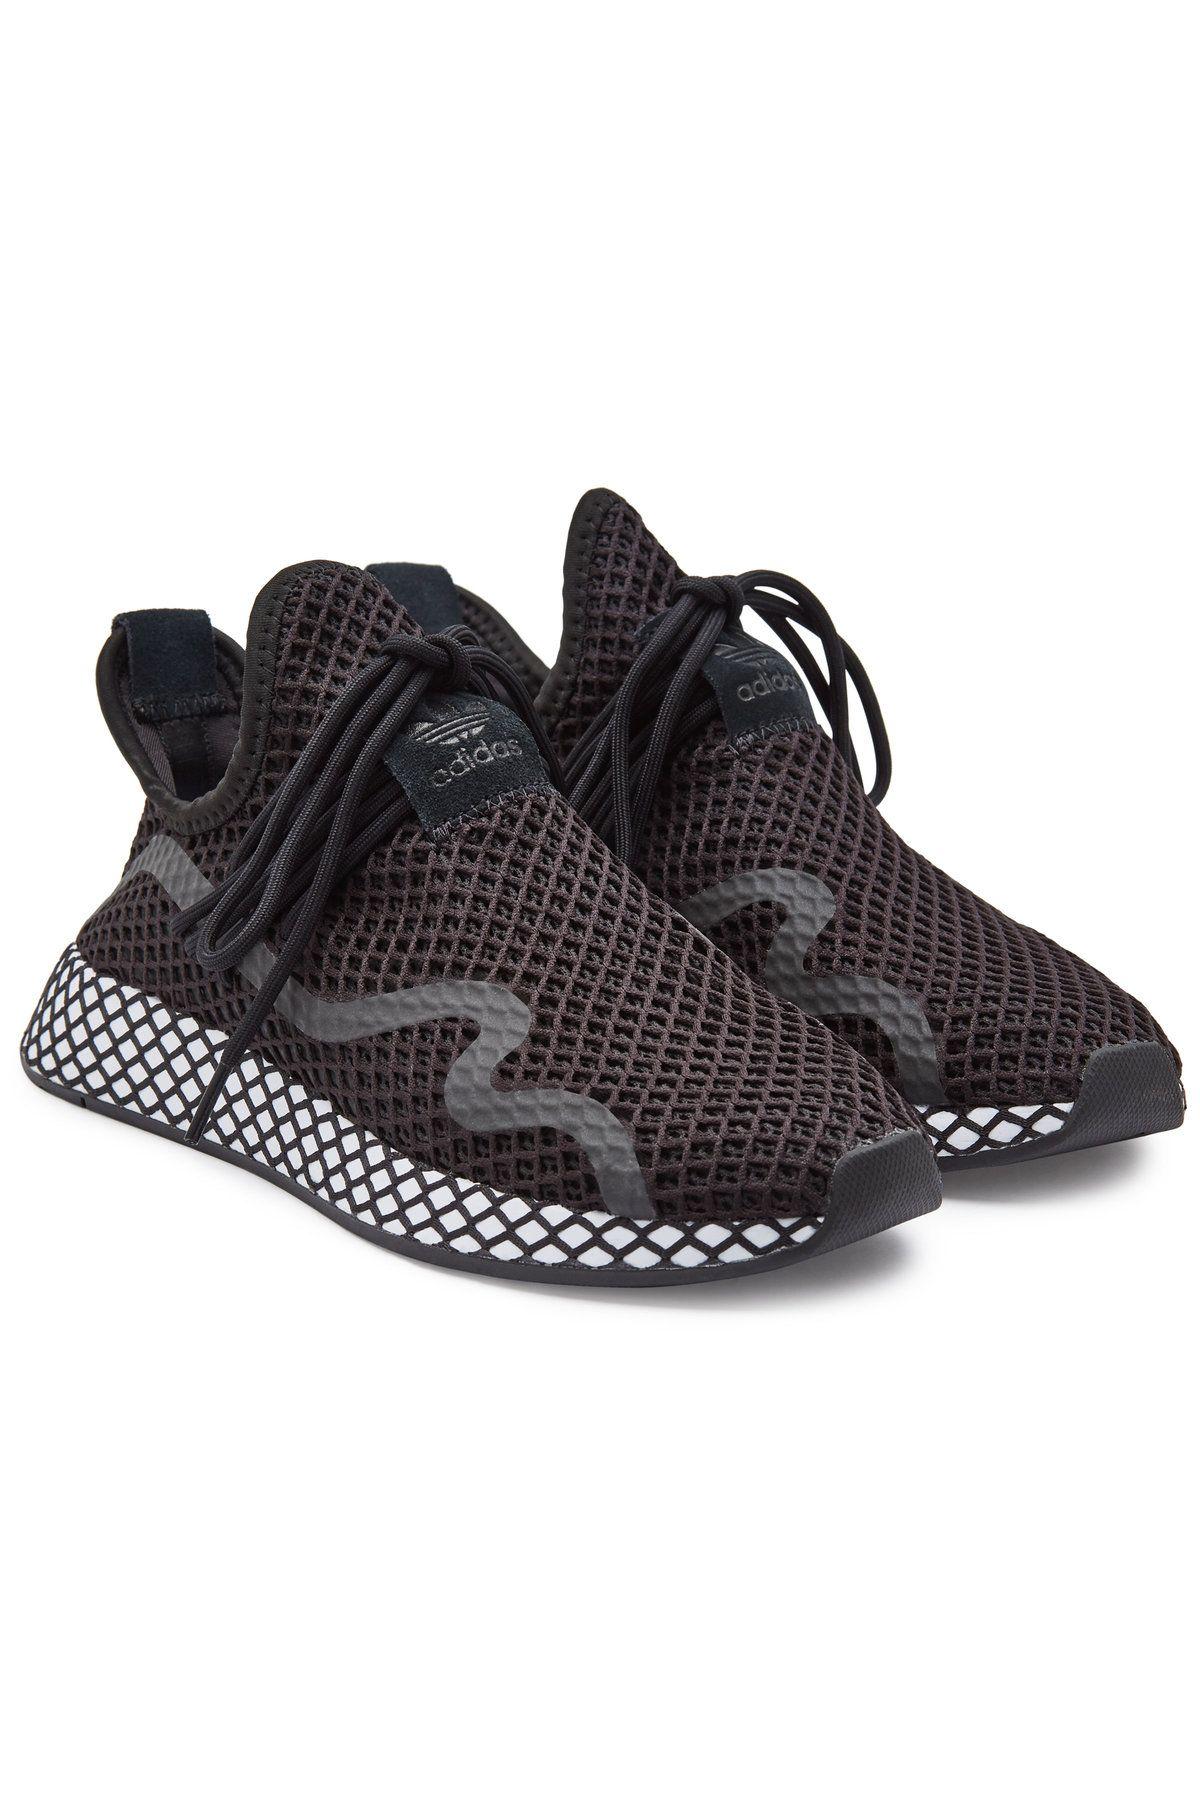 11e8e1f8 ADIDAS ORIGINALS DEERUPT S SNEAKERS WITH MESH. #adidasoriginals #shoes